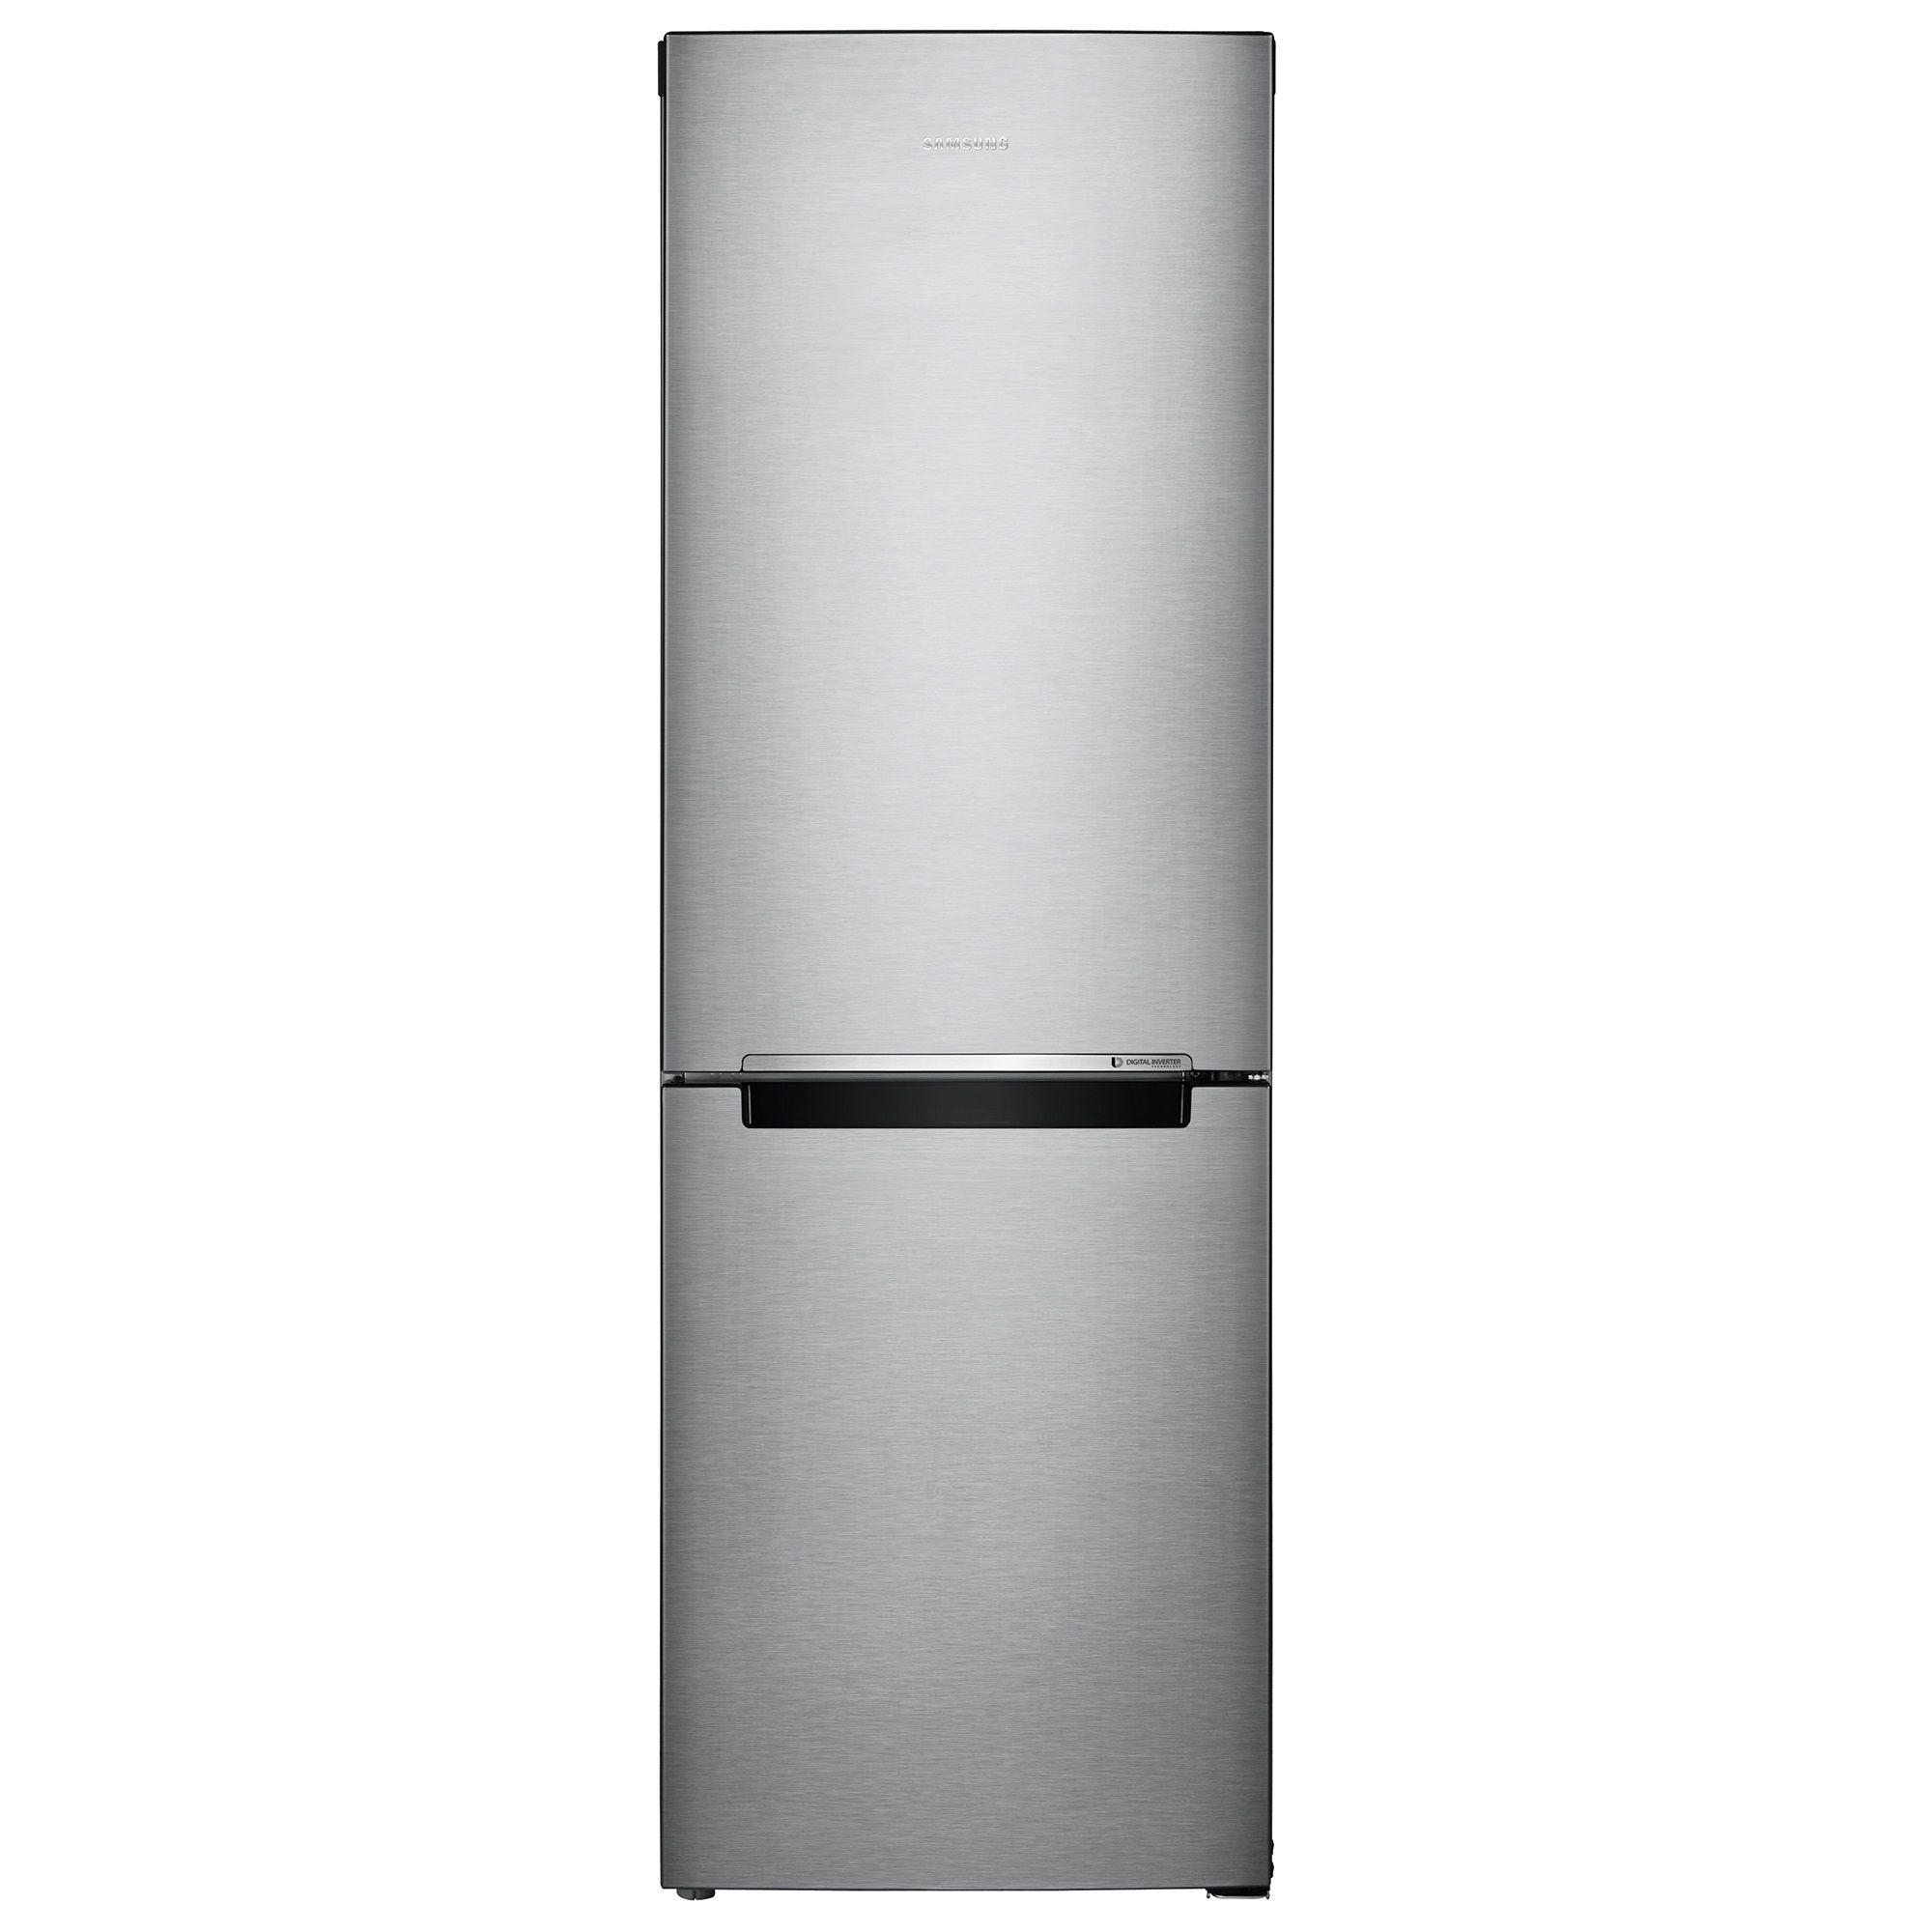 Хладилник с фризер Samsung RB33J3030SA/EF, 328 л, Клас A+, 185 cм, Metal Graphite